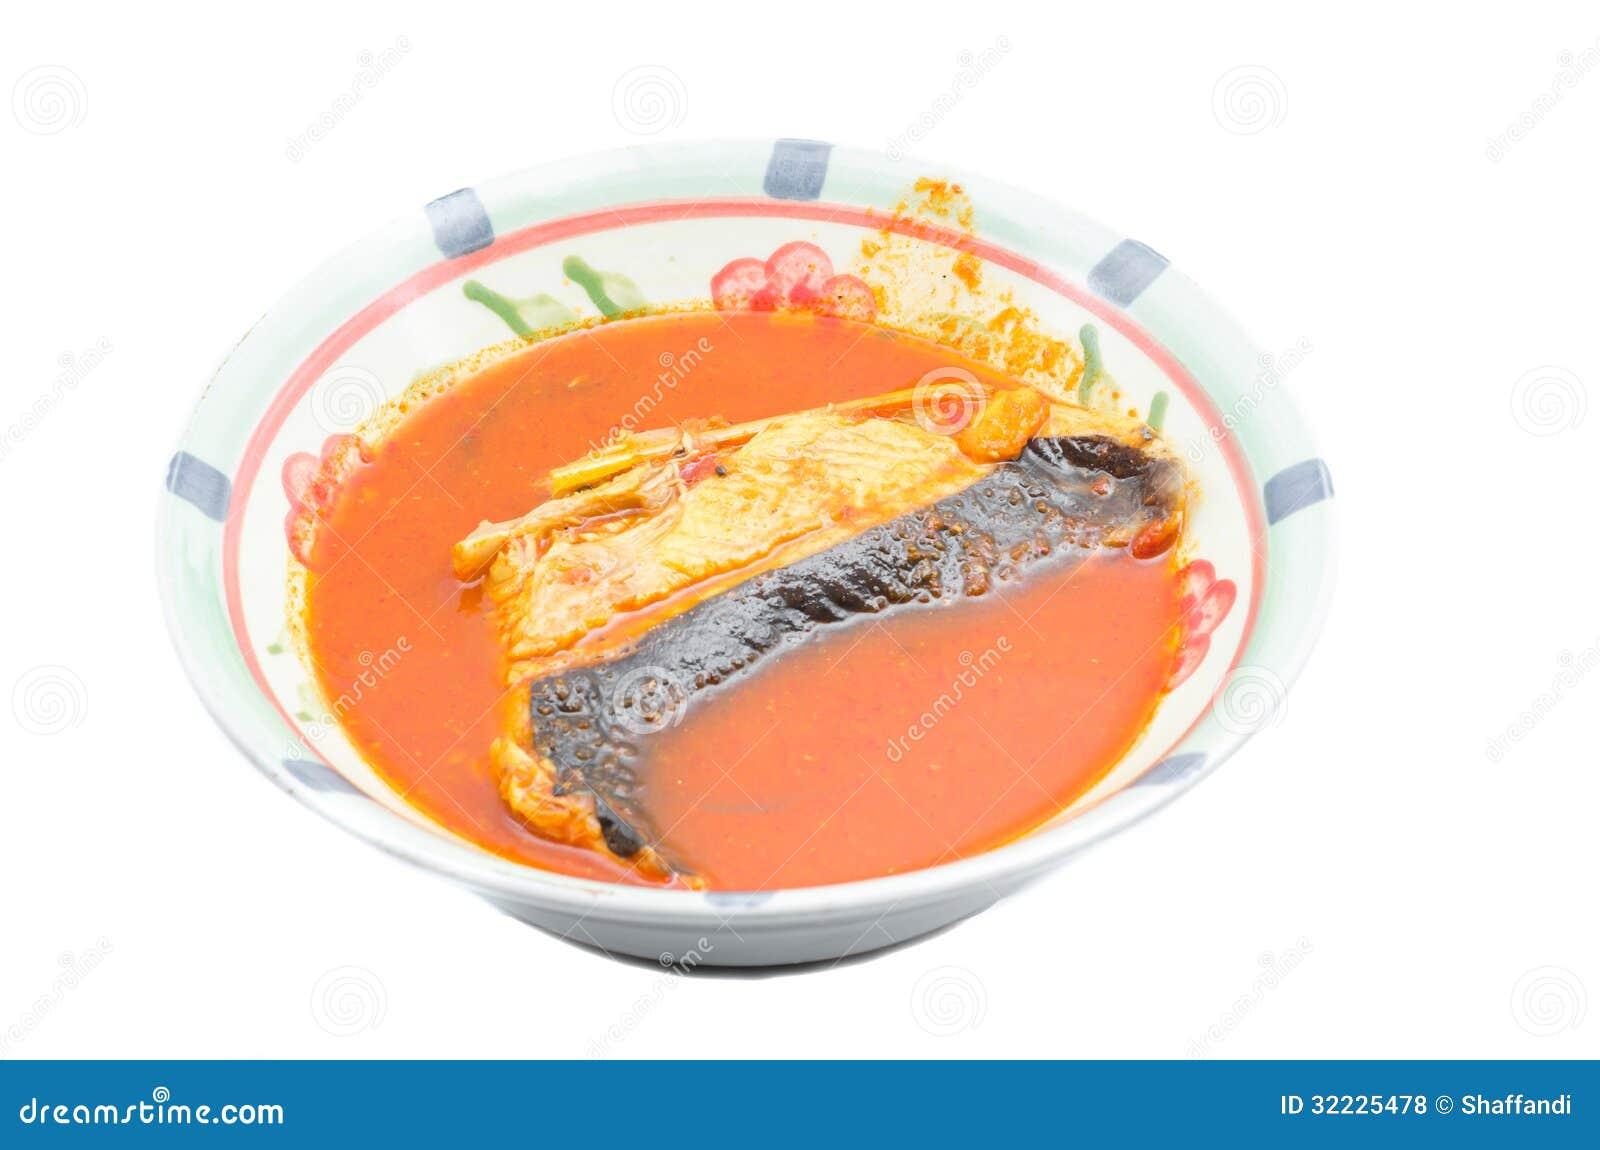 Download Asam Pedas Ikan Pari foto de stock. Imagem de caril, stingray - 32225478